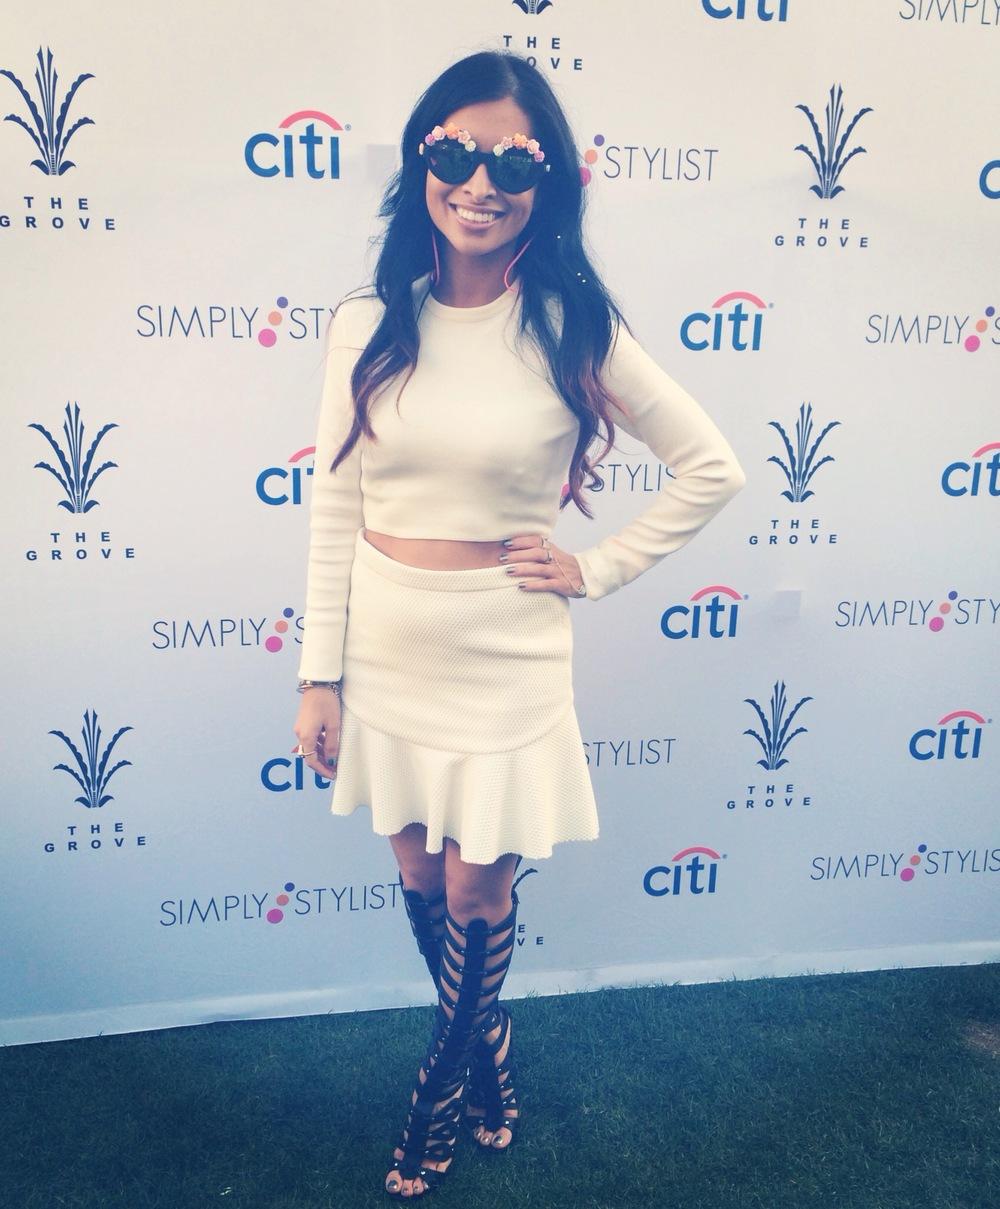 simplystylist_whiteonwhite_outfit_gladiatorheels